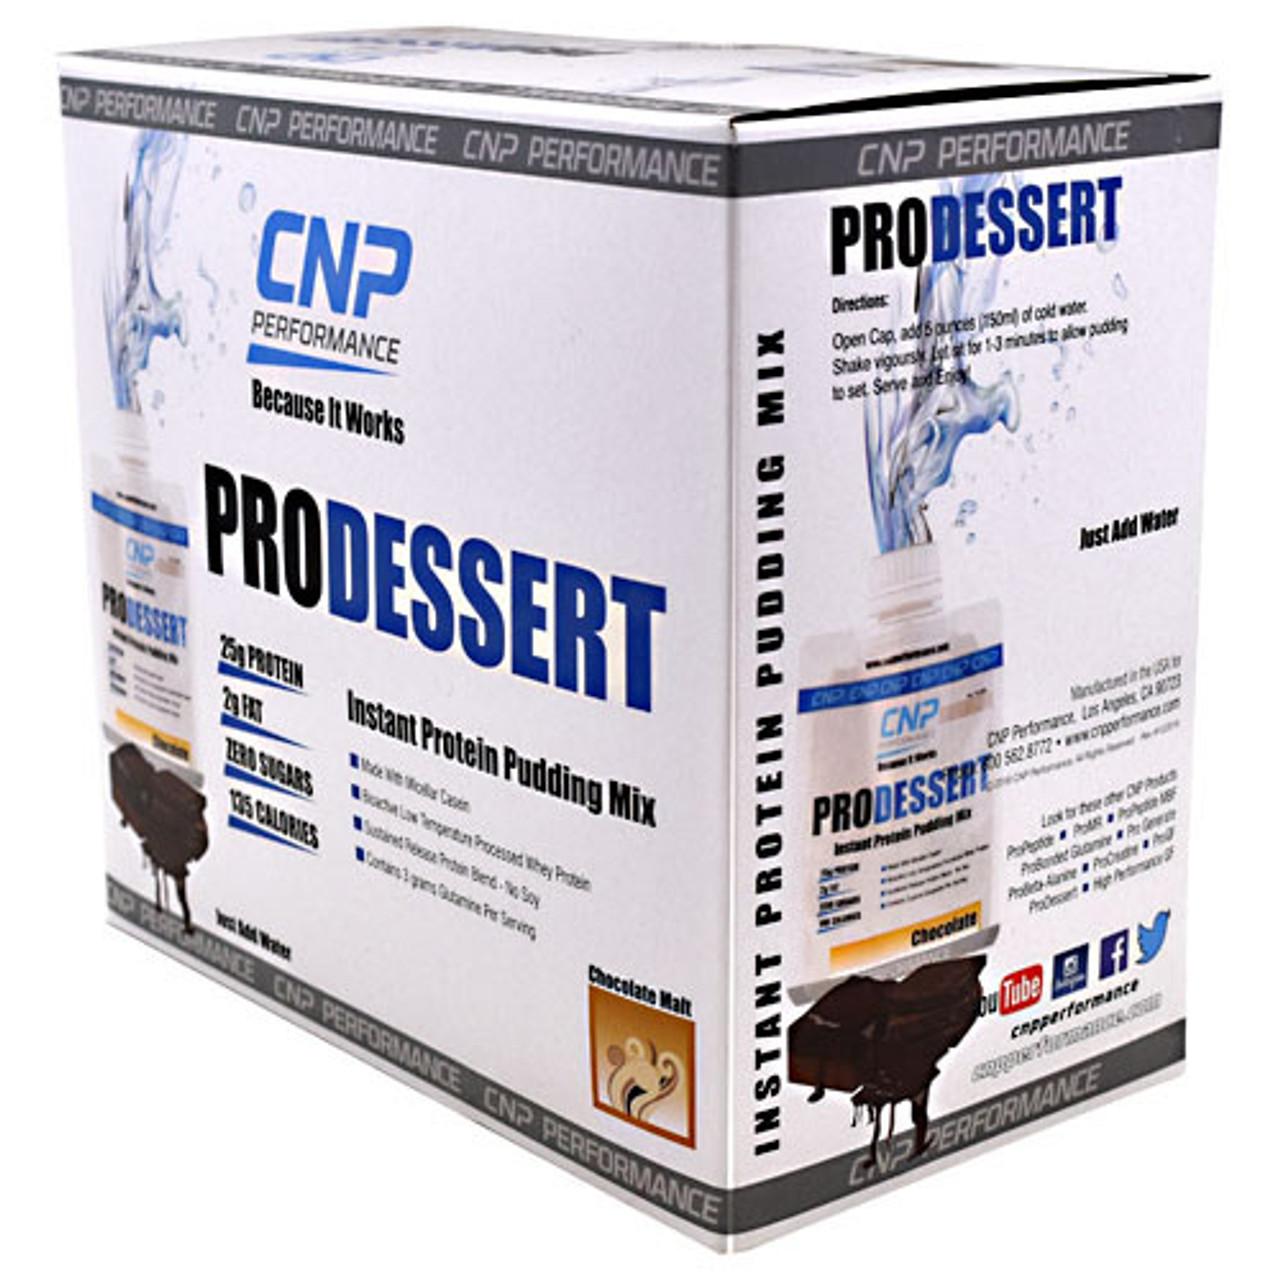 ProDessert 10 pk CNP Professionals